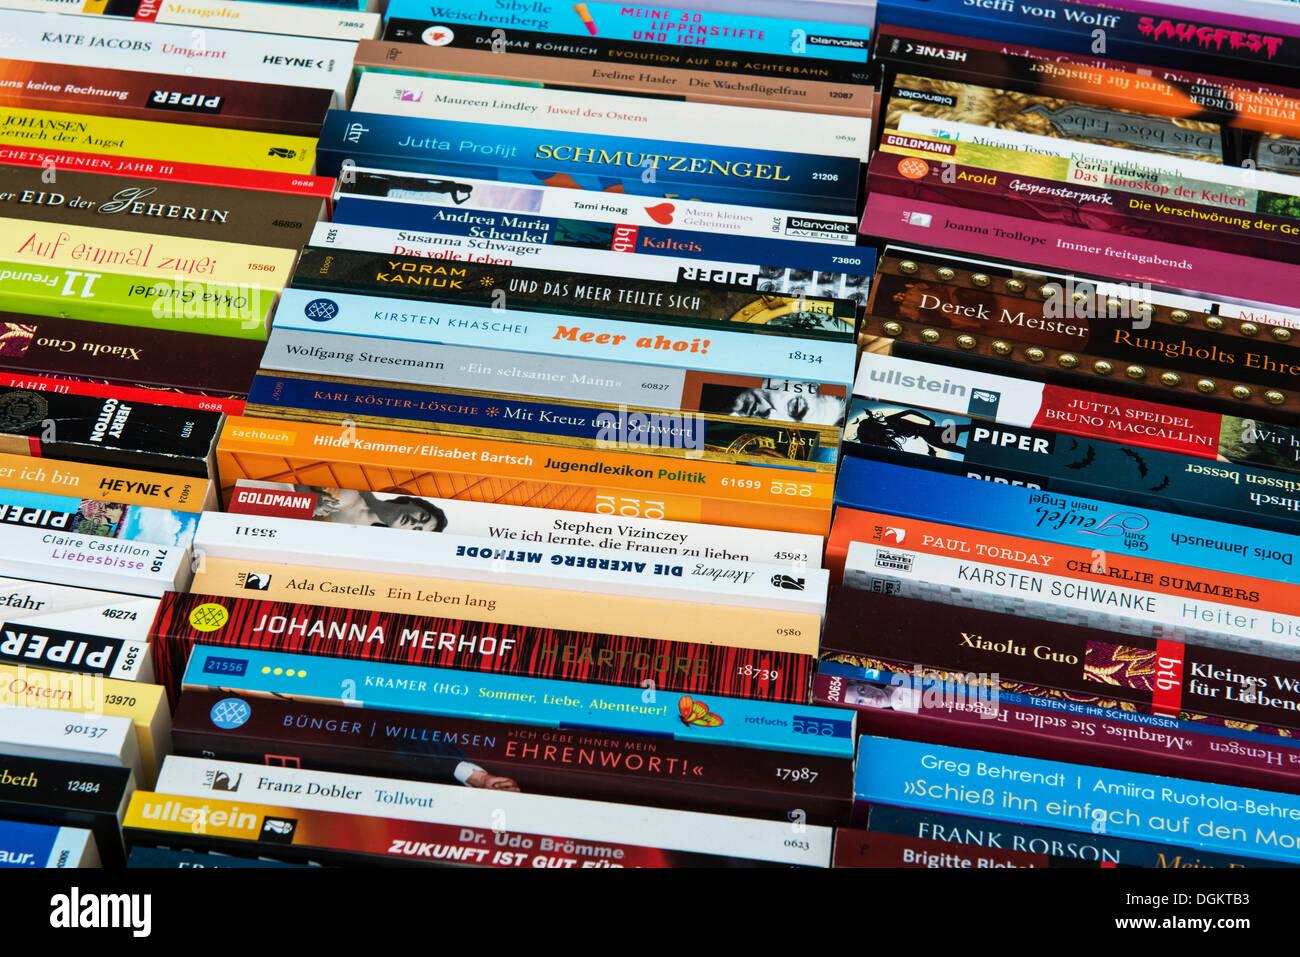 Book market, paperbacks, fiction, holiday reading, German language, PublicGround - Stock Image